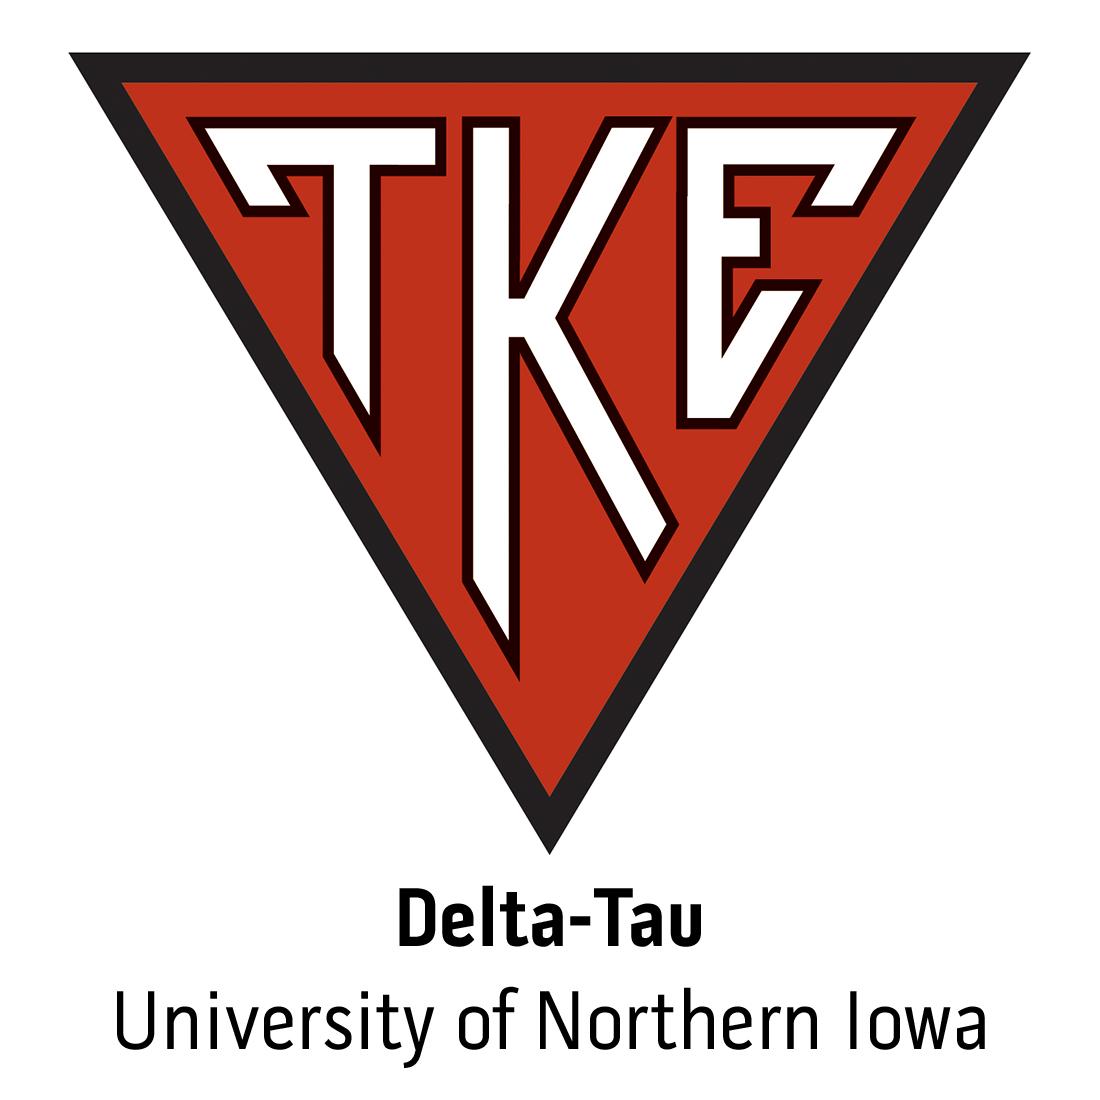 Delta-Tau Chapter at University of Northern Iowa